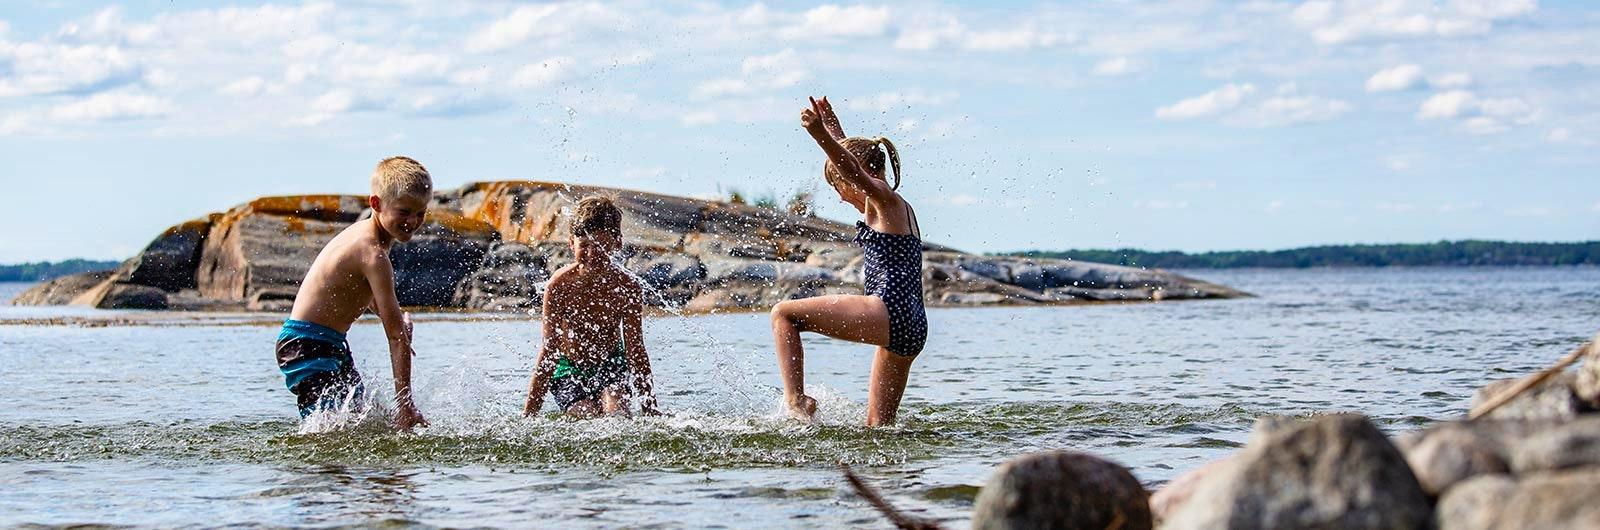 barn leker i vattnet